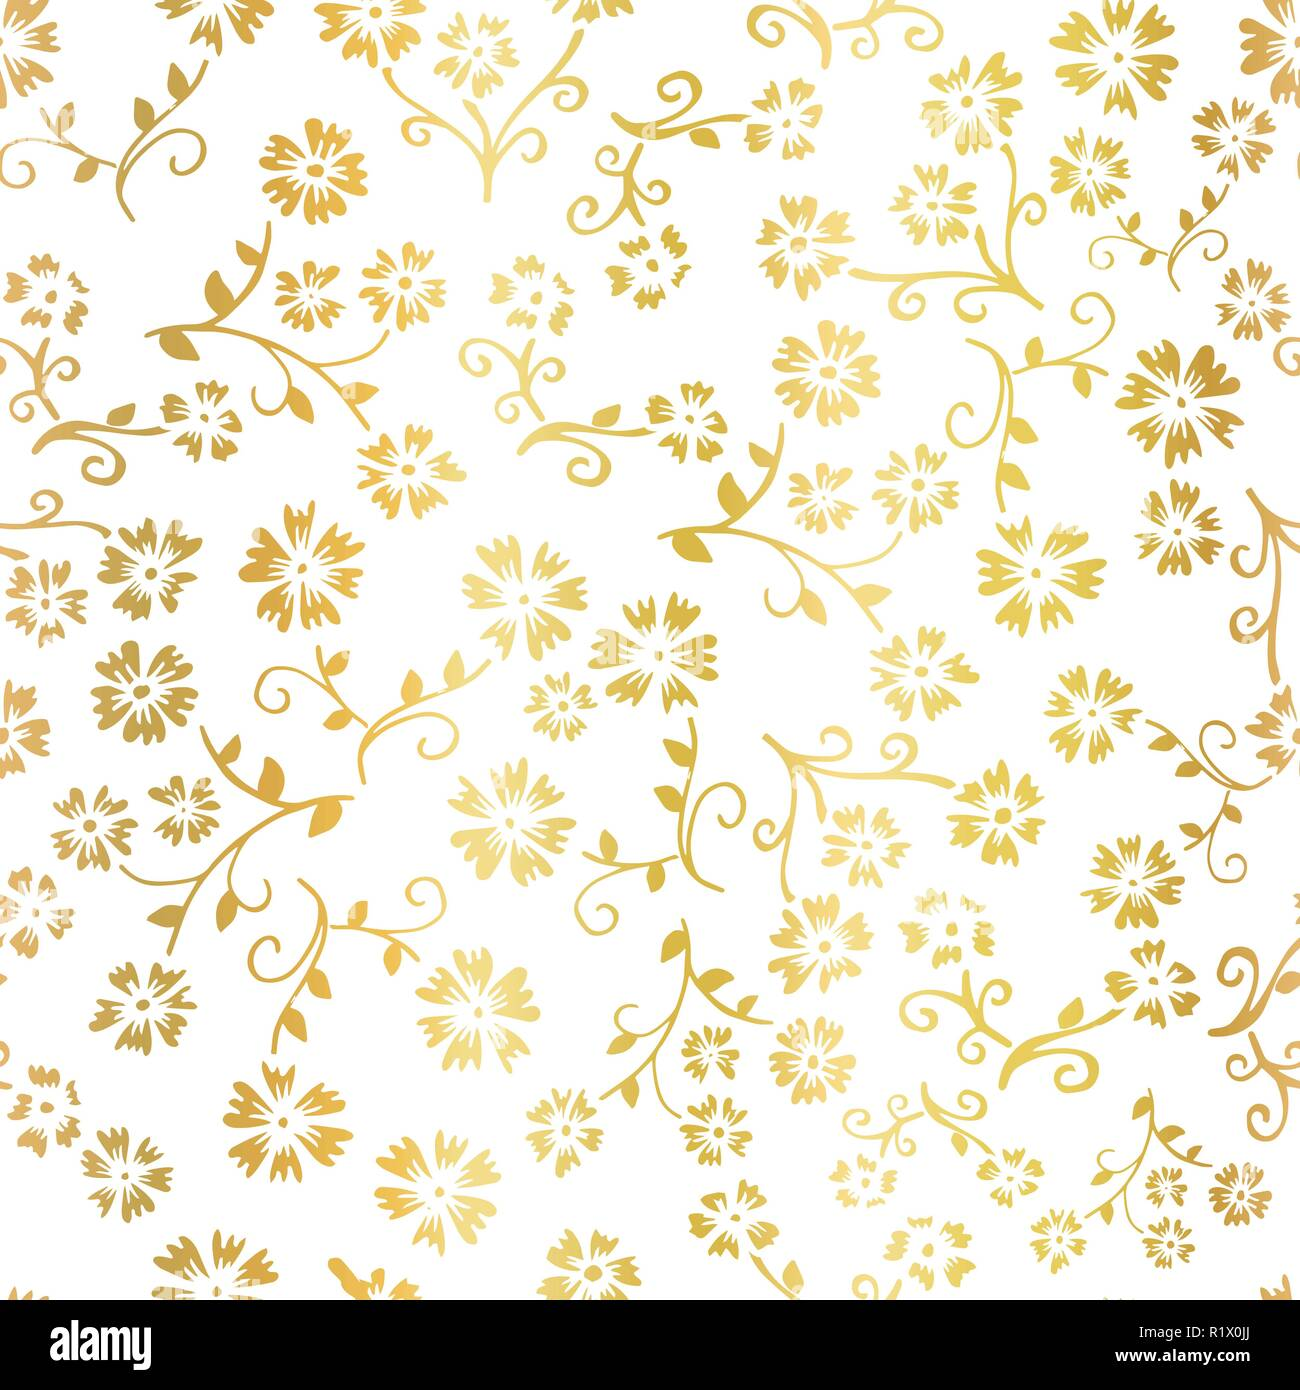 Gold Foil Flower Vector Seamless Pattern Background Elegant